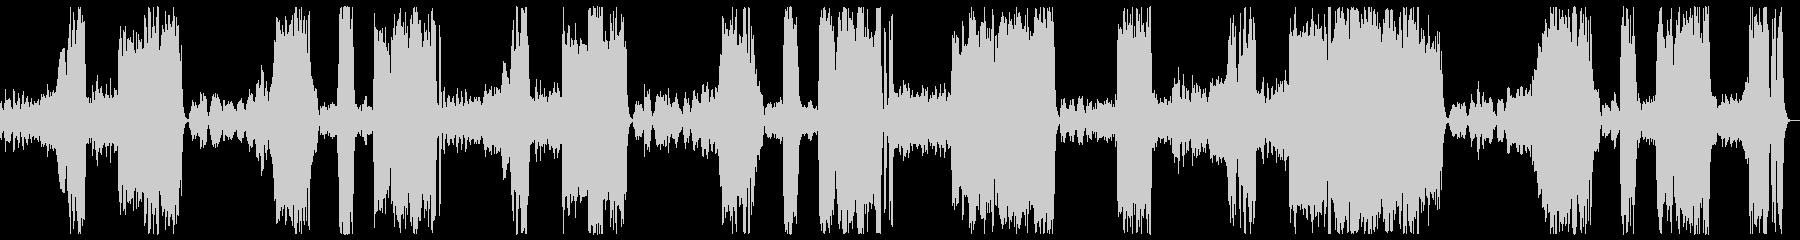 交響曲第40番 ト短調 第1楽章 初稿の未再生の波形